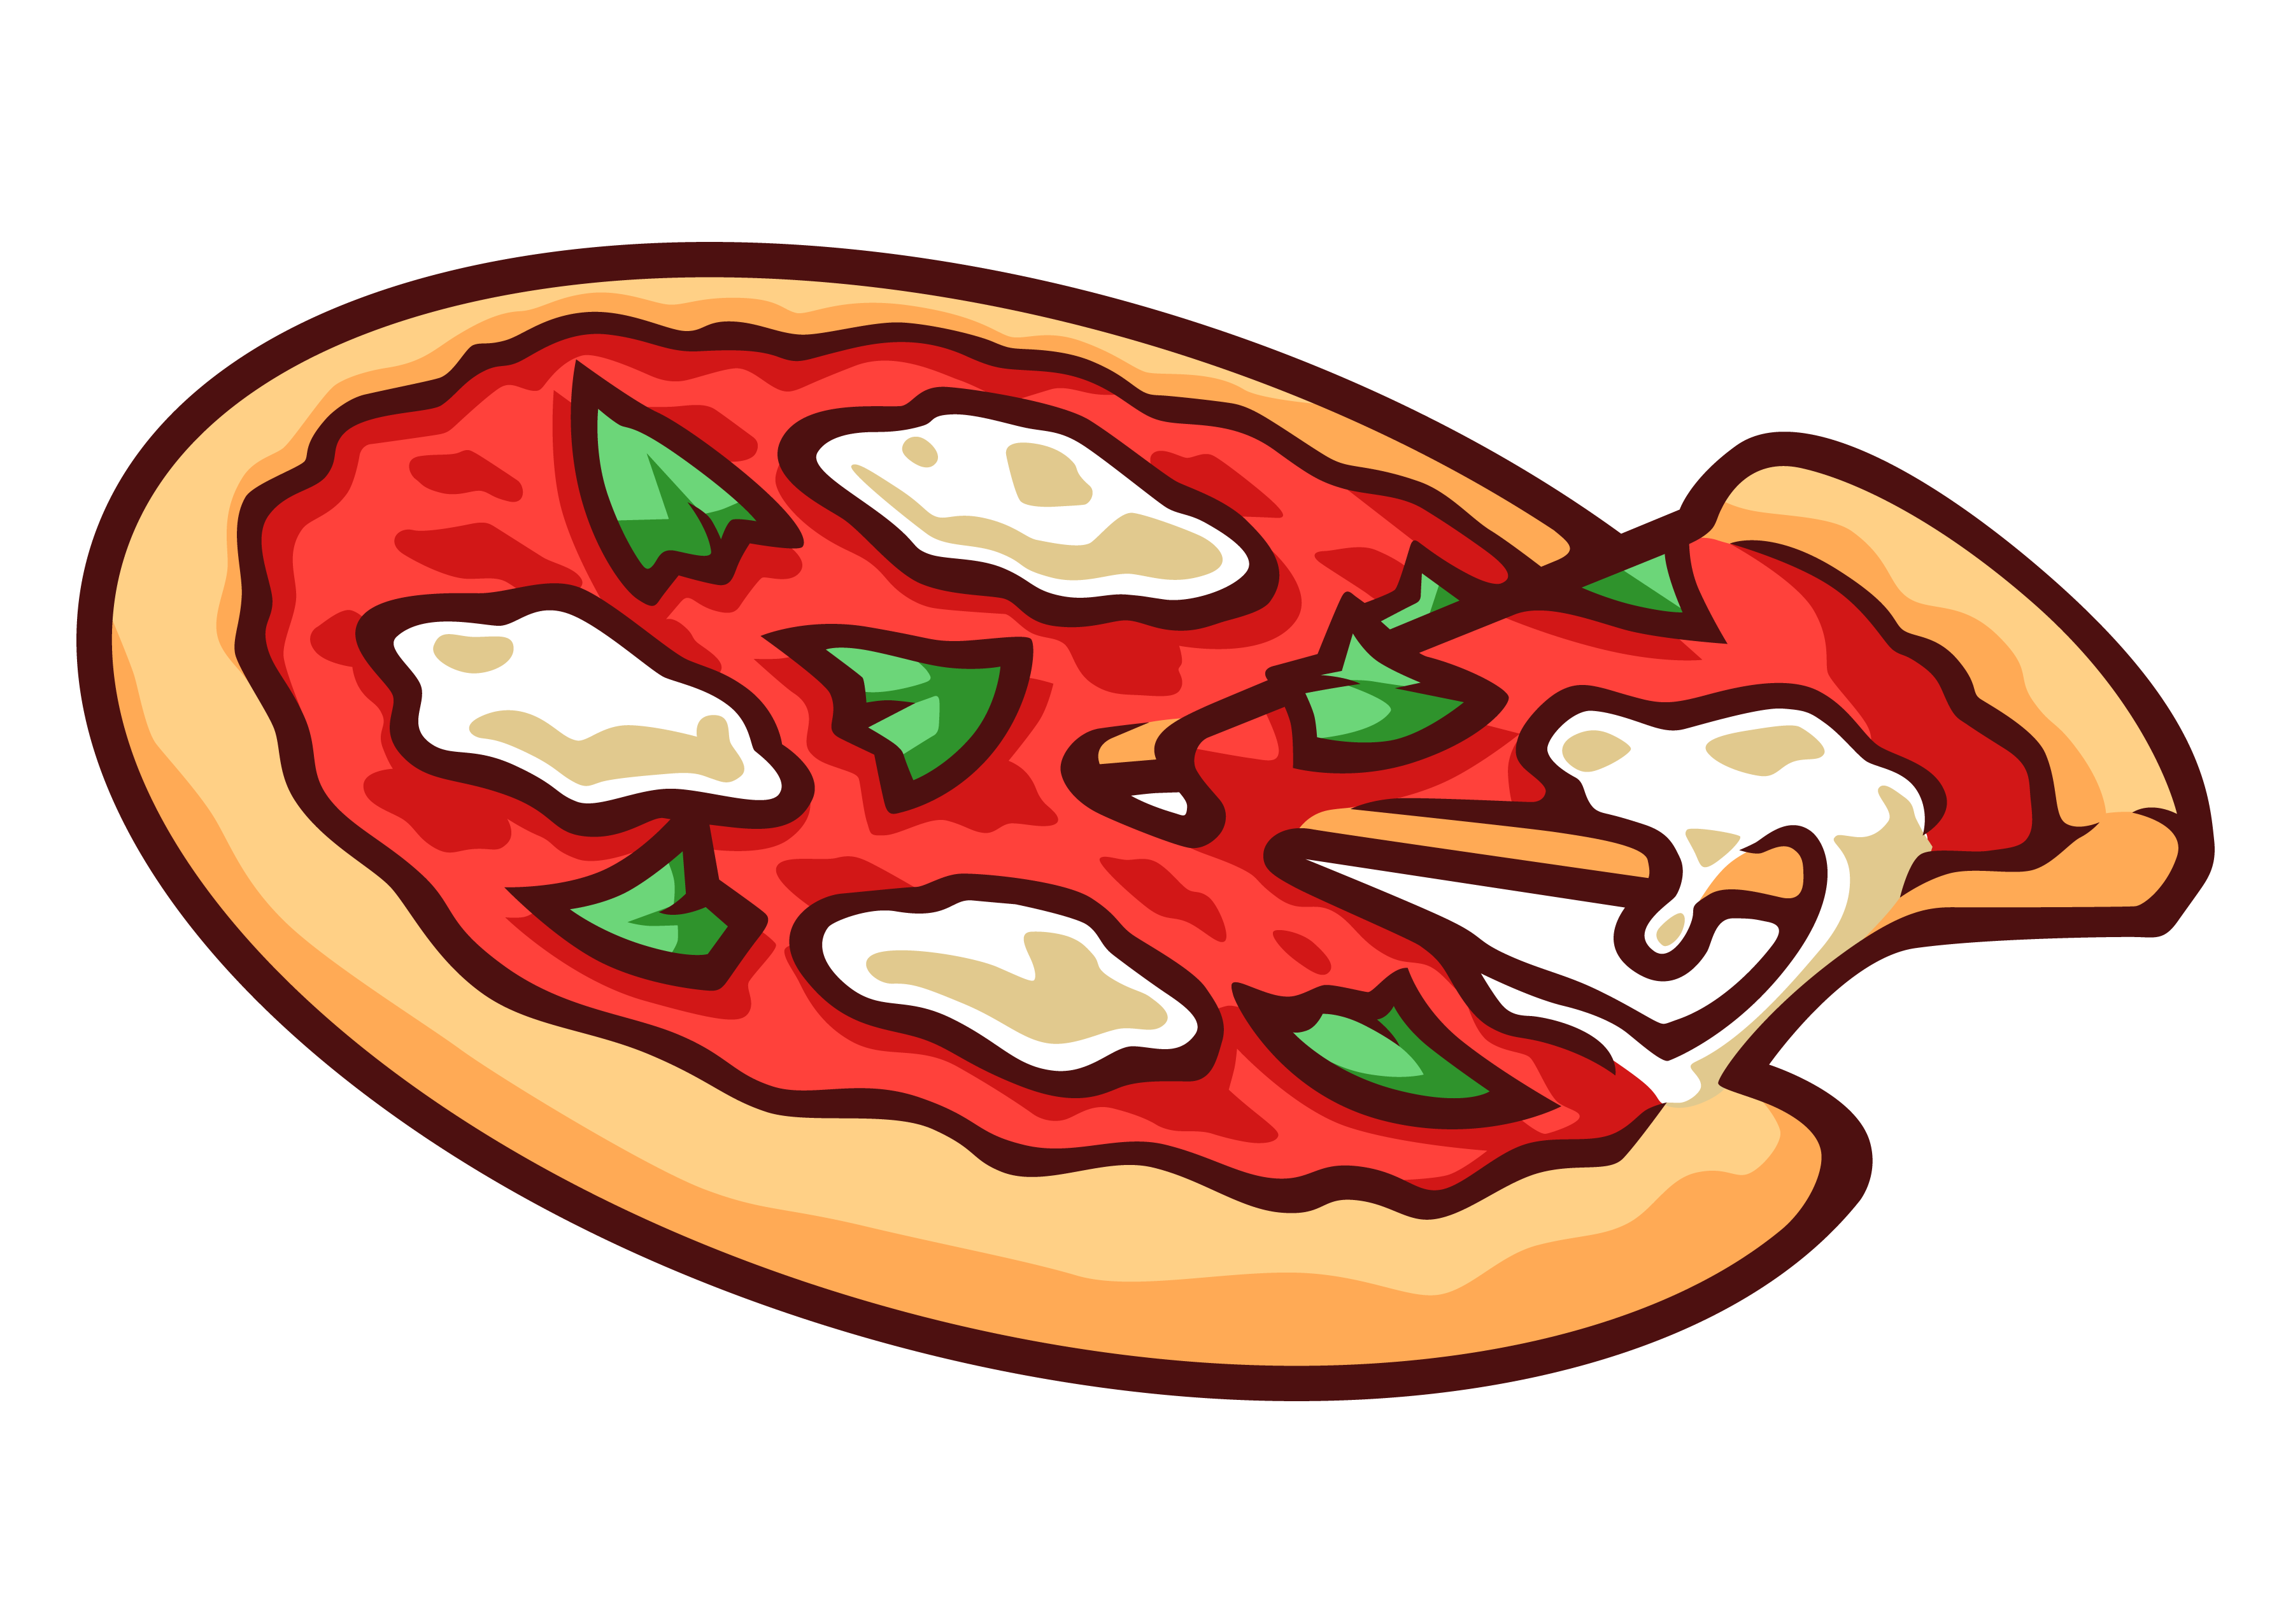 3579x2551 Pizza Clip Art Free Cliparts